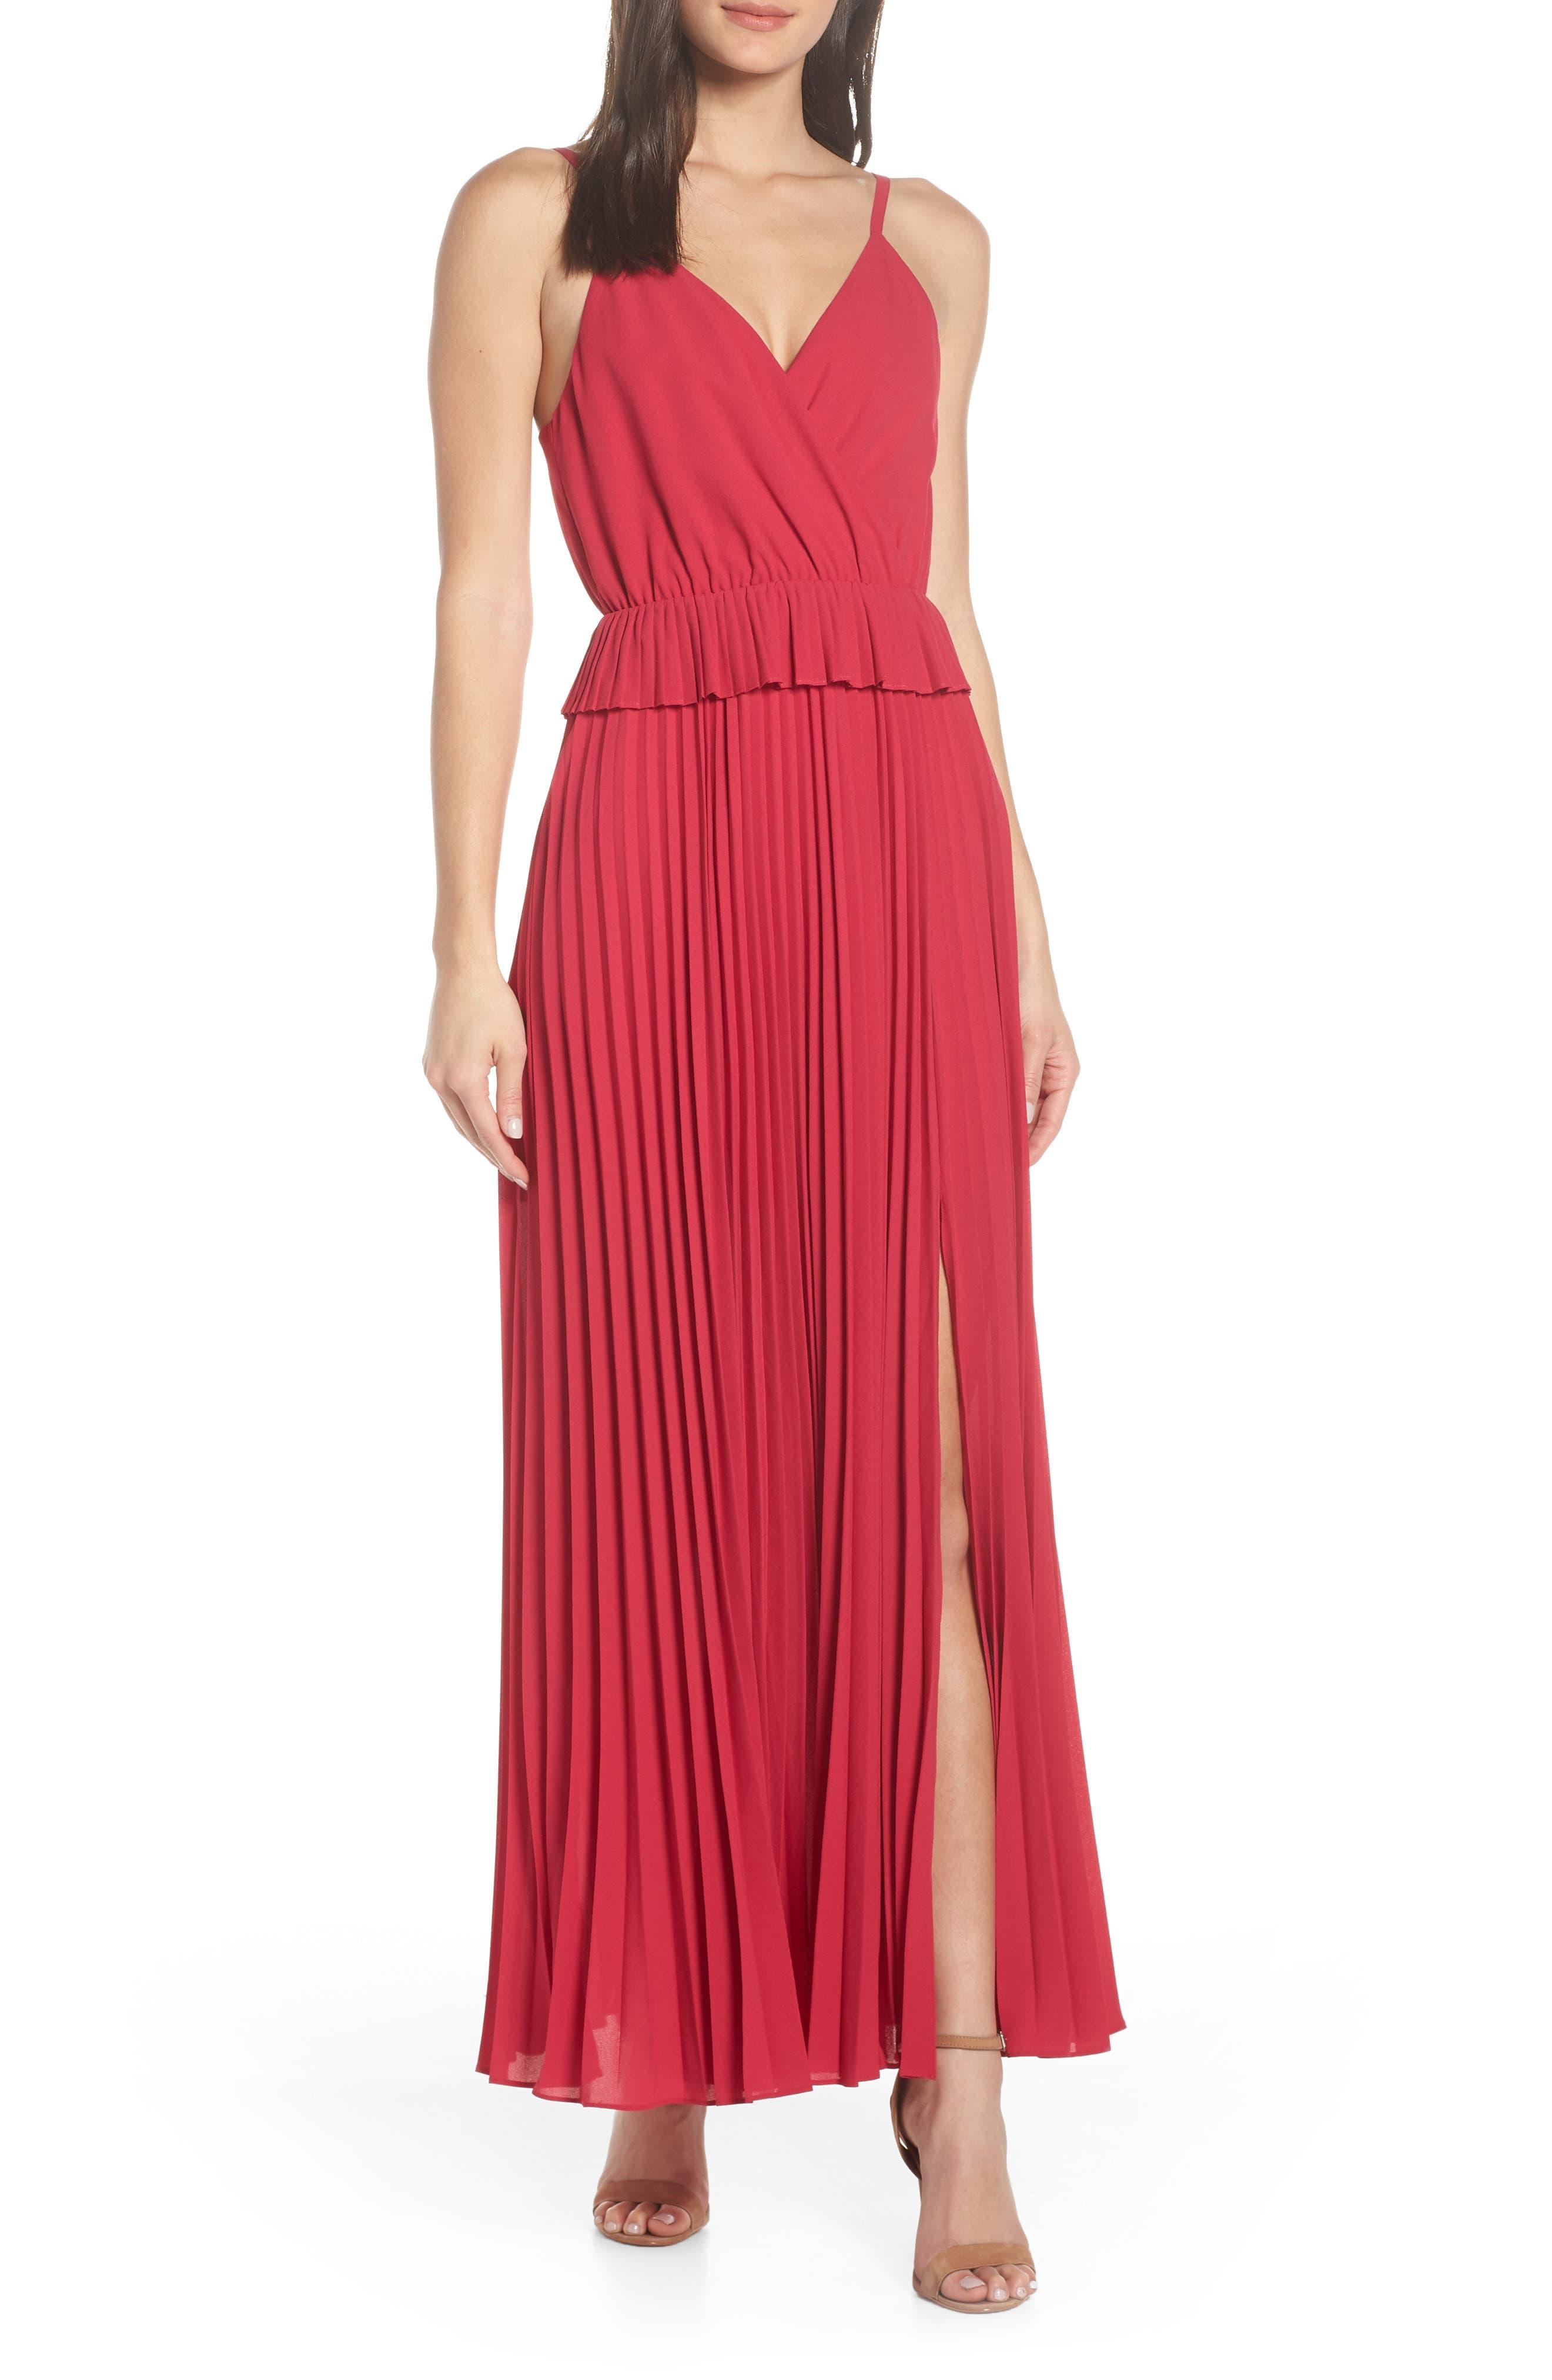 ALI & JAY, Olivet Pleated Maxi Dress, Main thumbnail 1, color, RASPBERRY